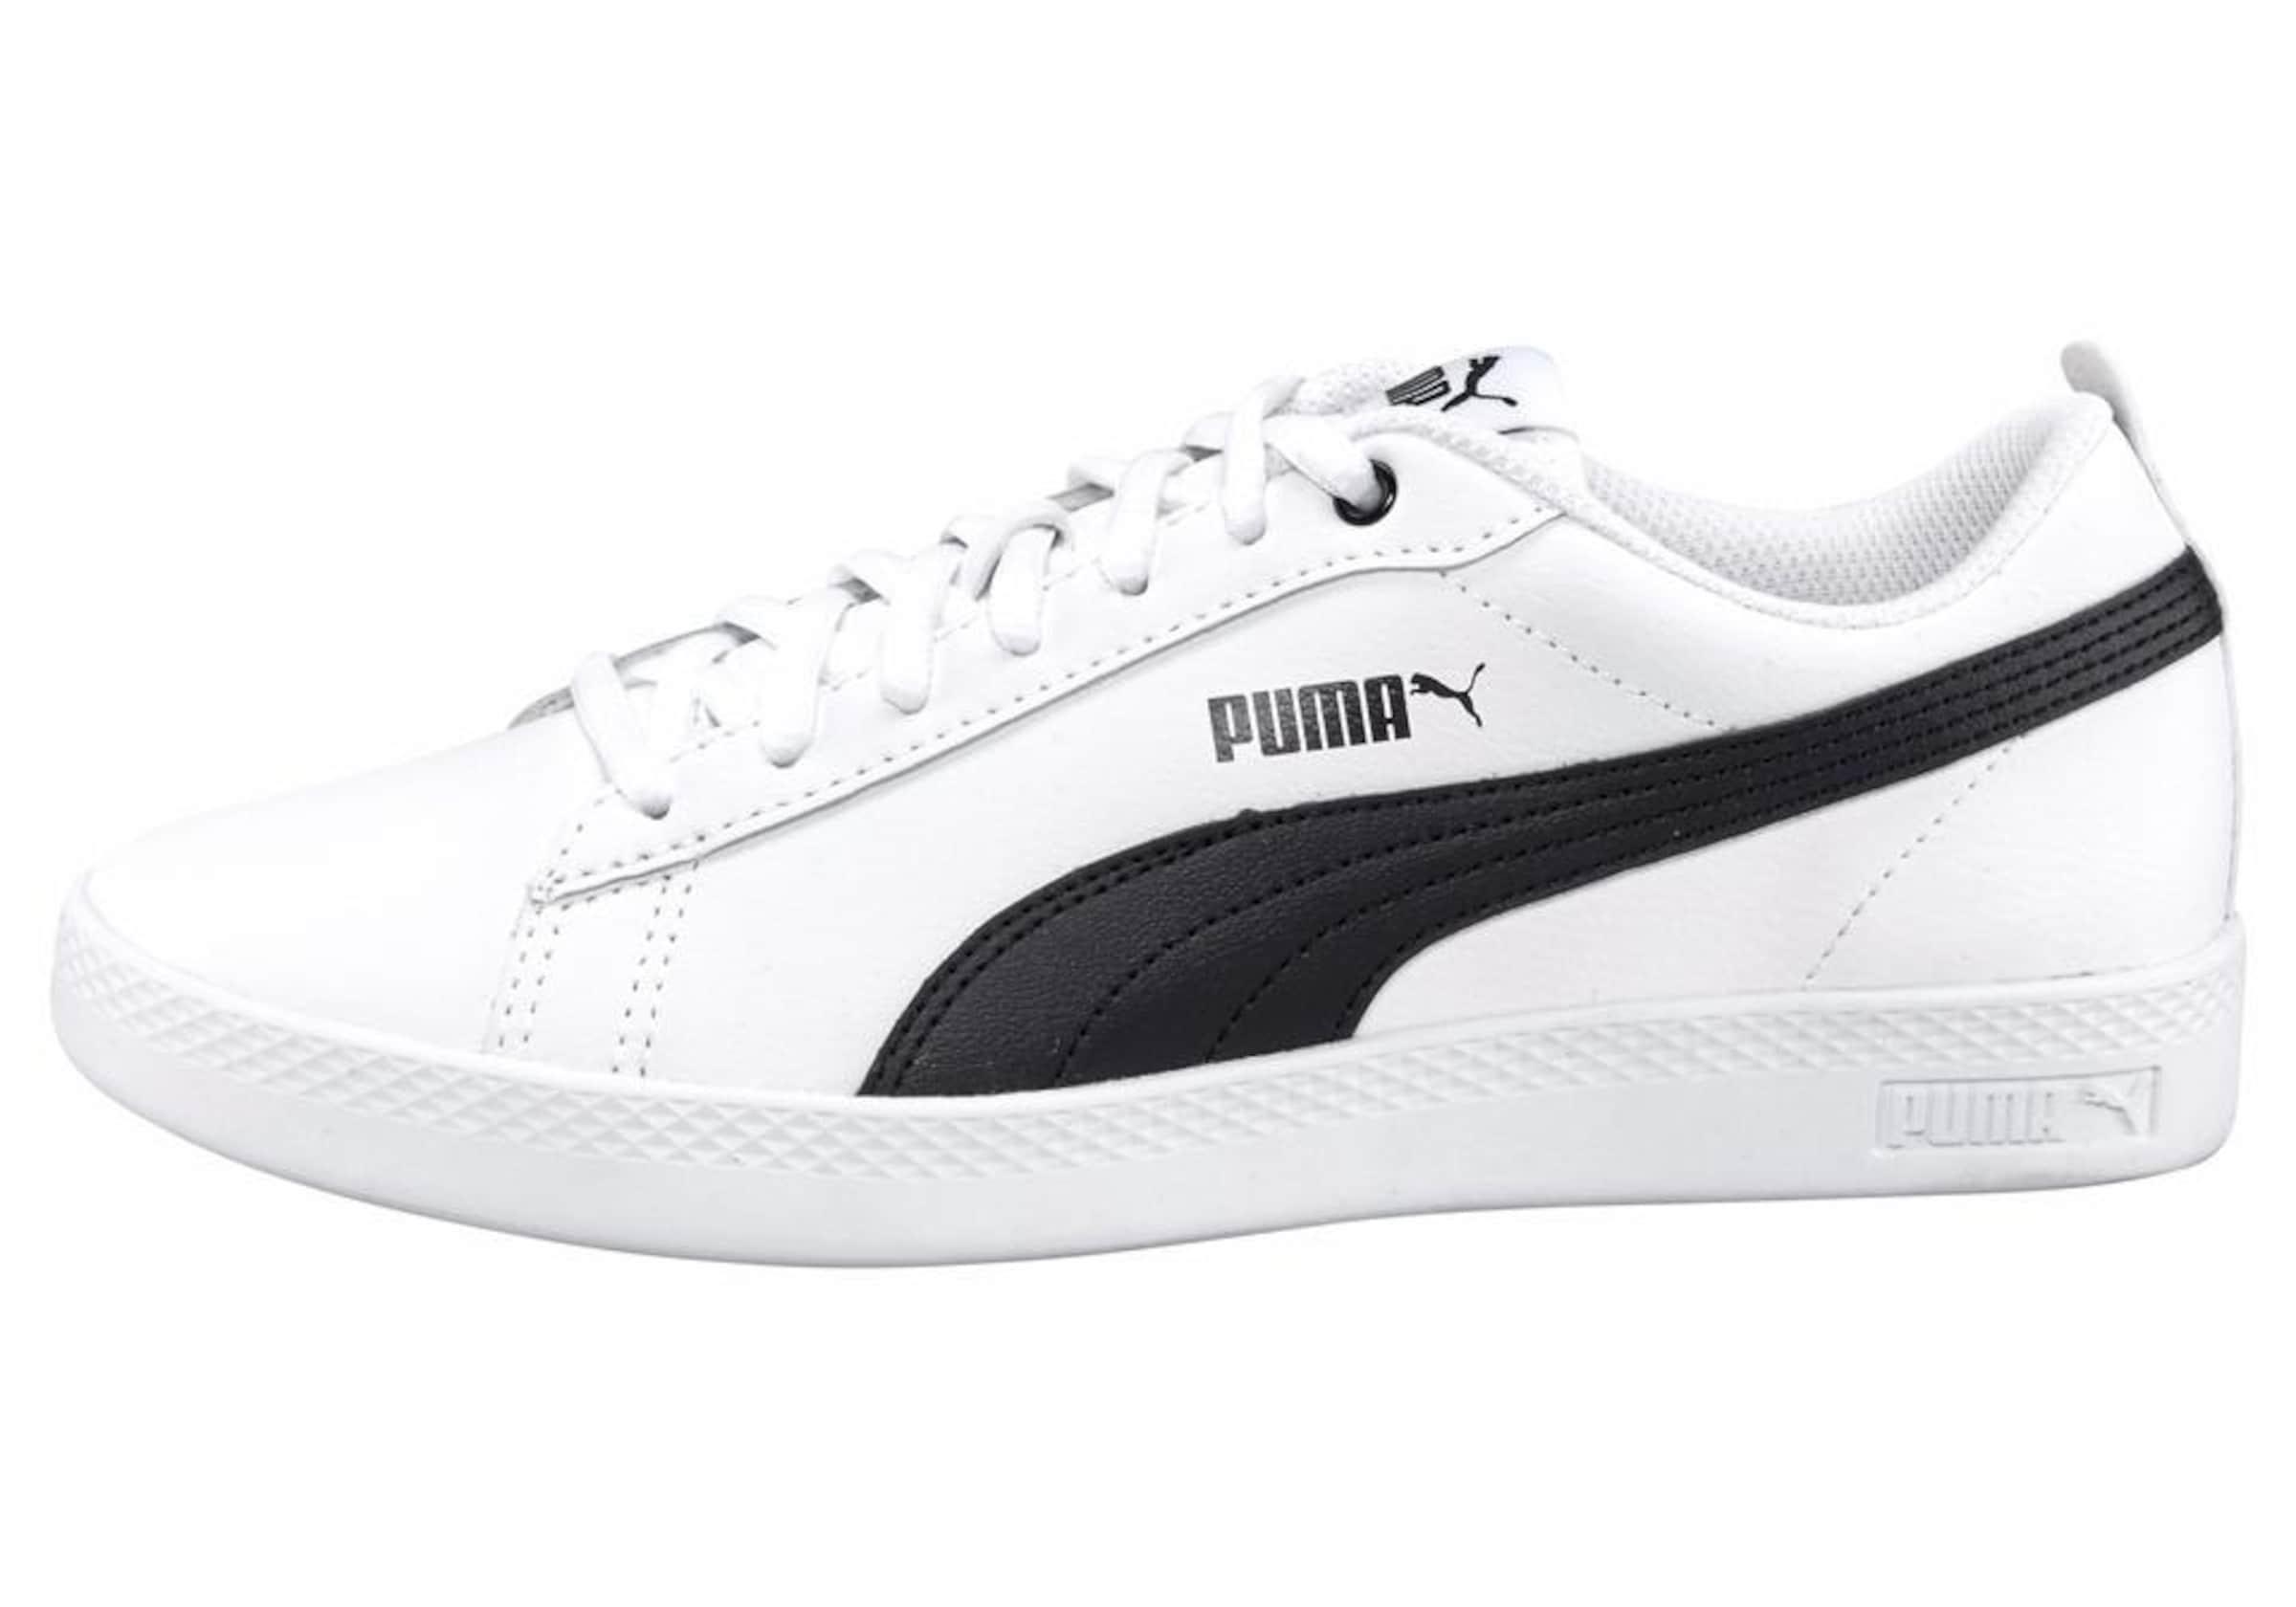 In Wns SchwarzWeiß Sneakers V2 'smash L' Puma WdrCxeEQBo